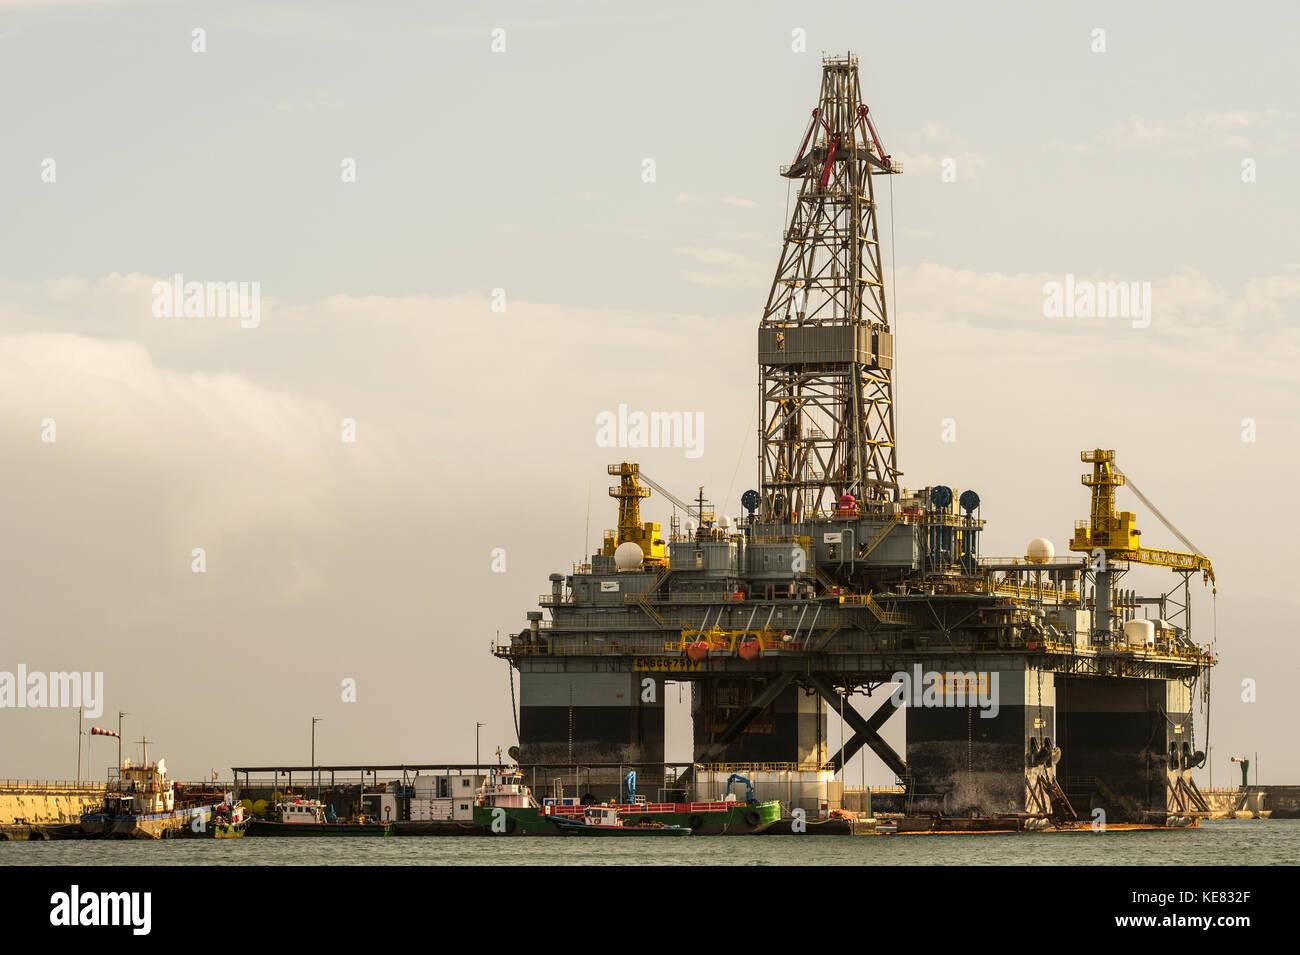 Ensco 7500 piattaforma di perforazione, Santa Cruz porto; Santa Cruz Tenerife, Isole Canarie, Spagna Foto Stock